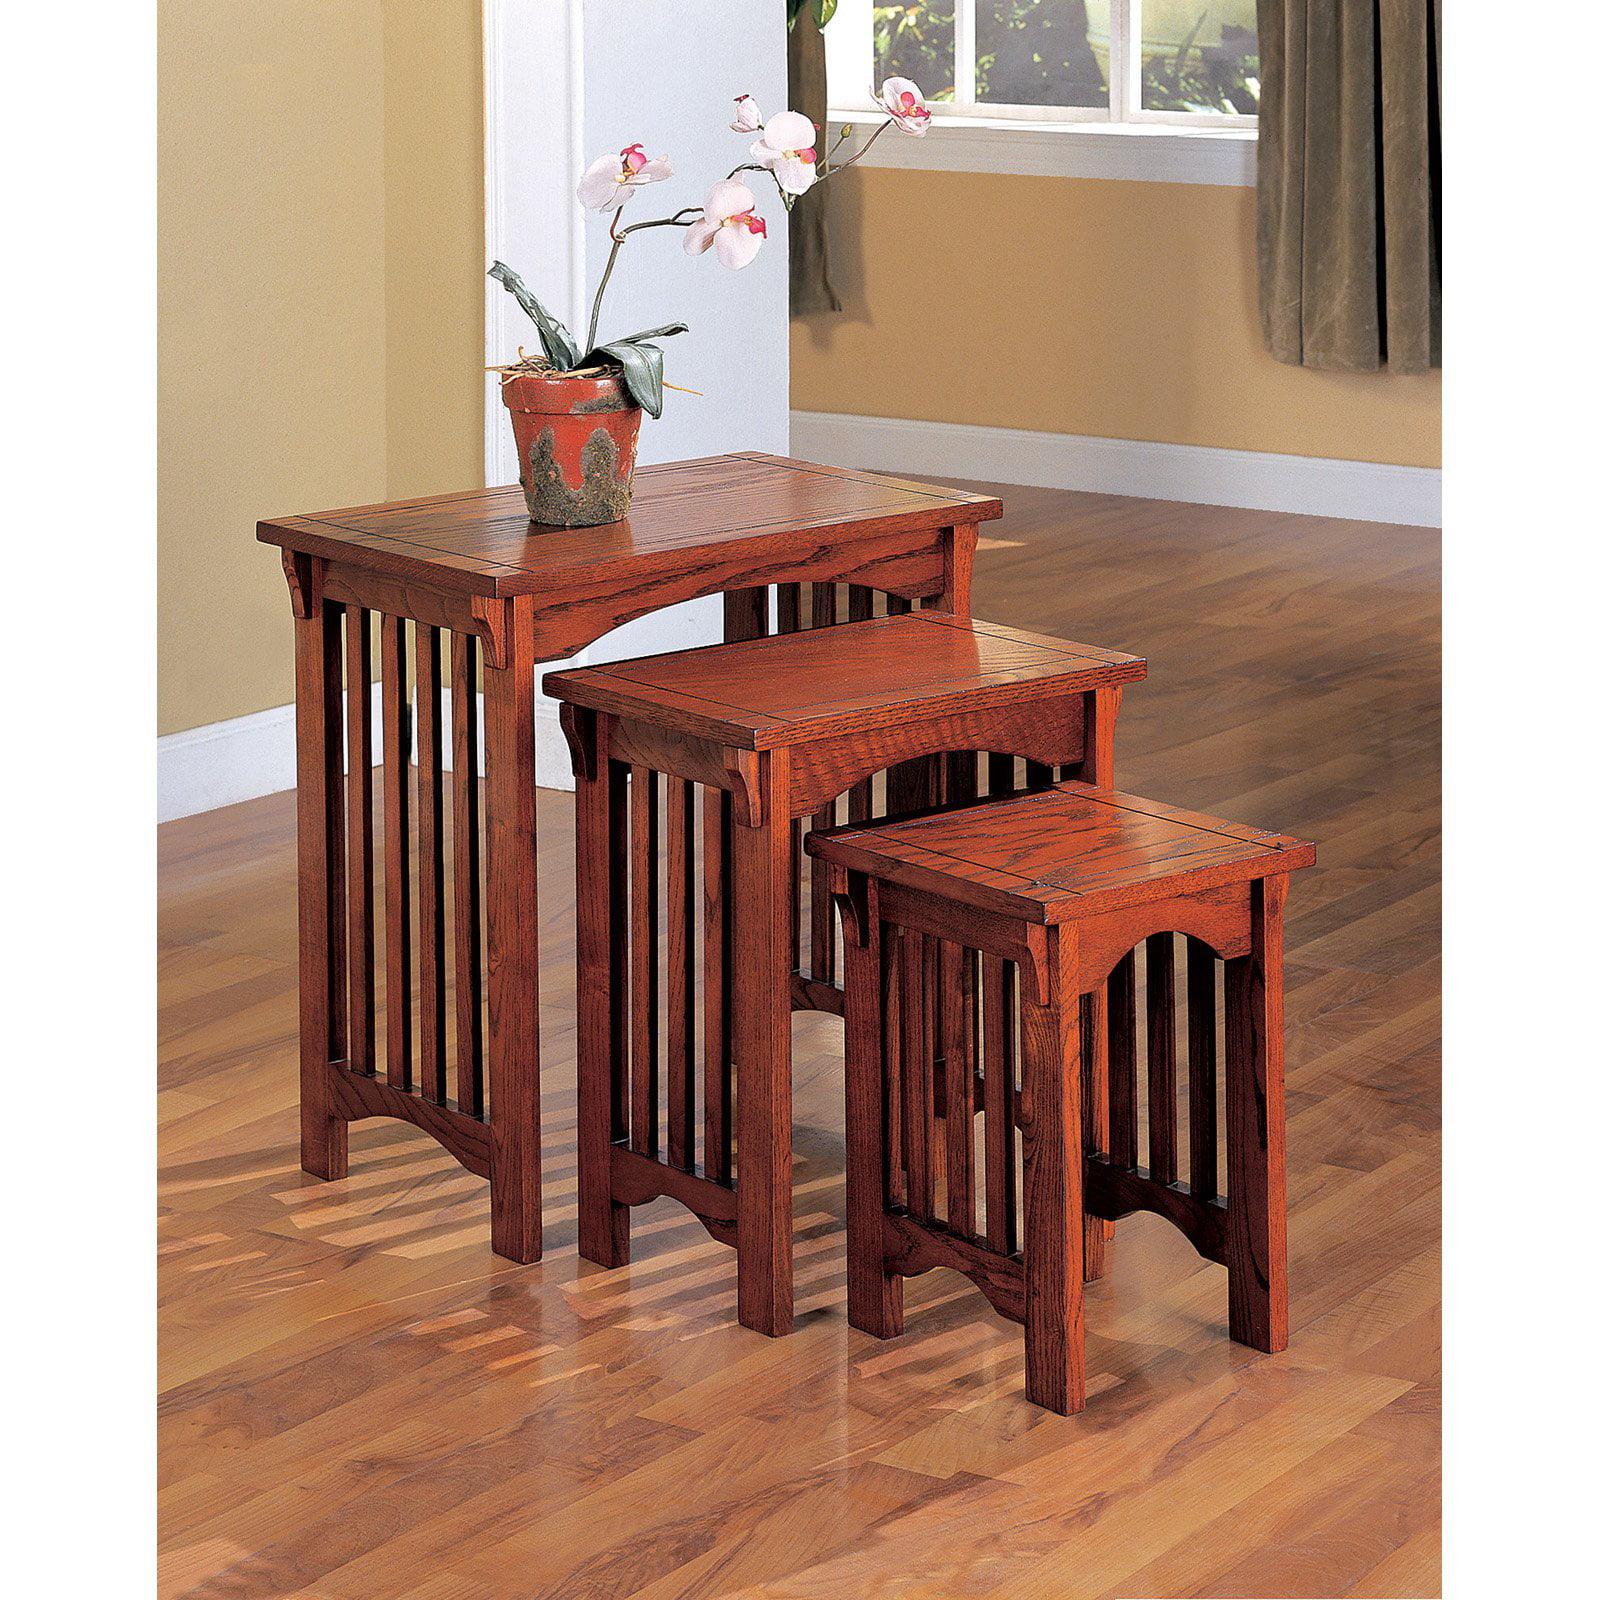 Coaster Company Nesting Table, Warm Brown